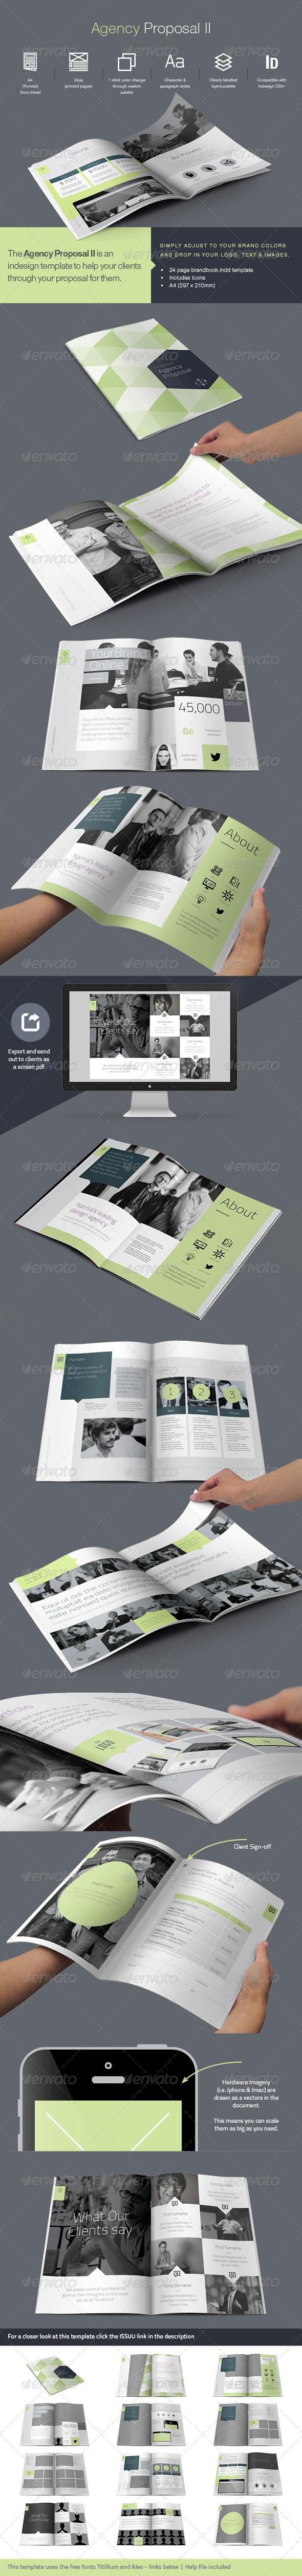 Agency Proposal II - Brochures Print Templates